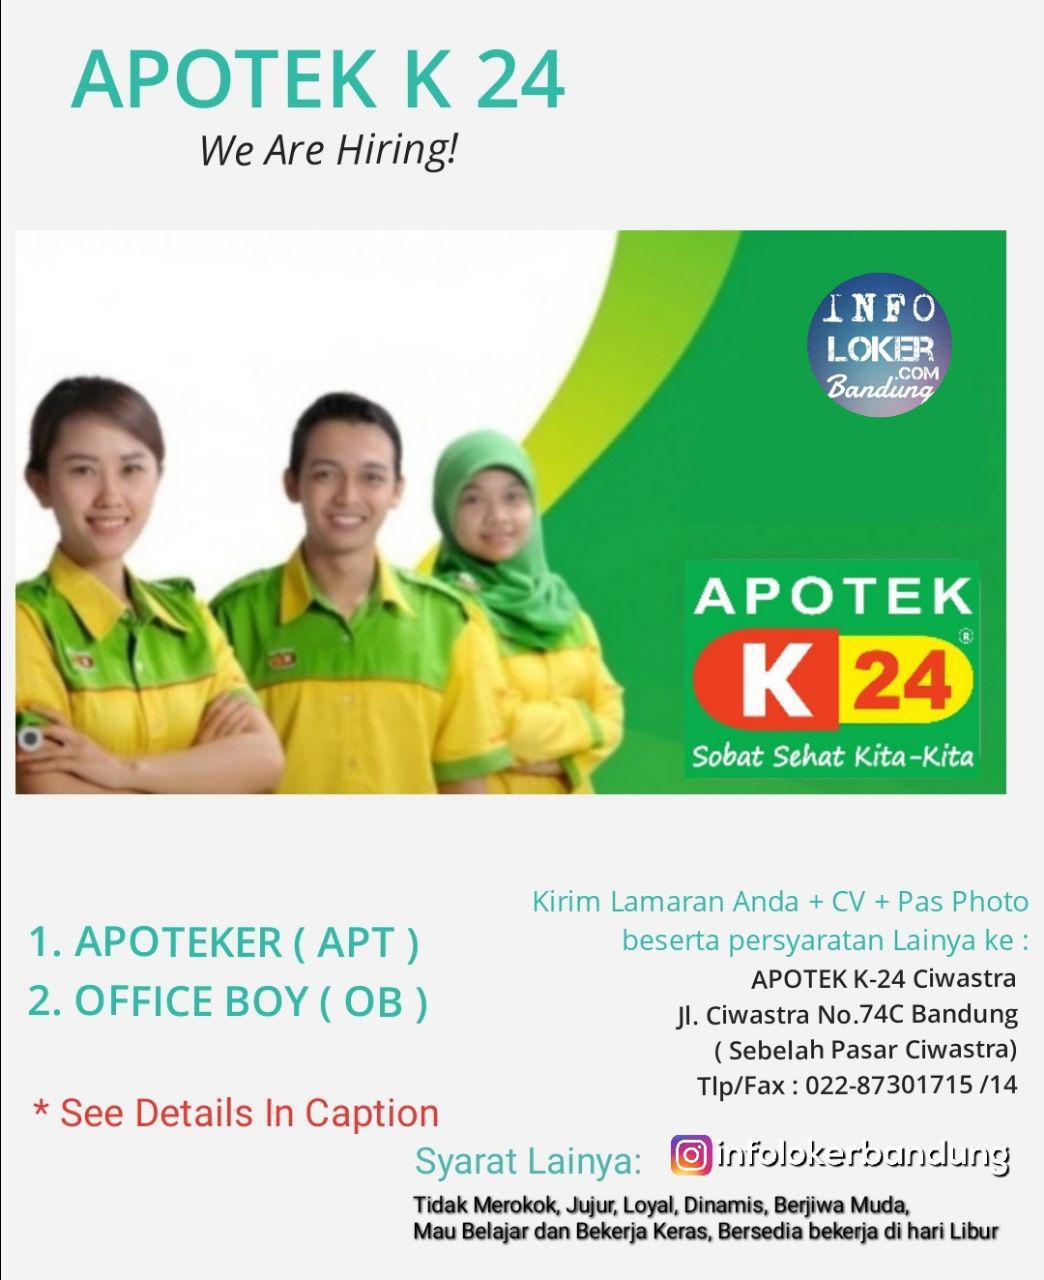 Lowongan Kerja Apotek K 24 Bandung September 2018